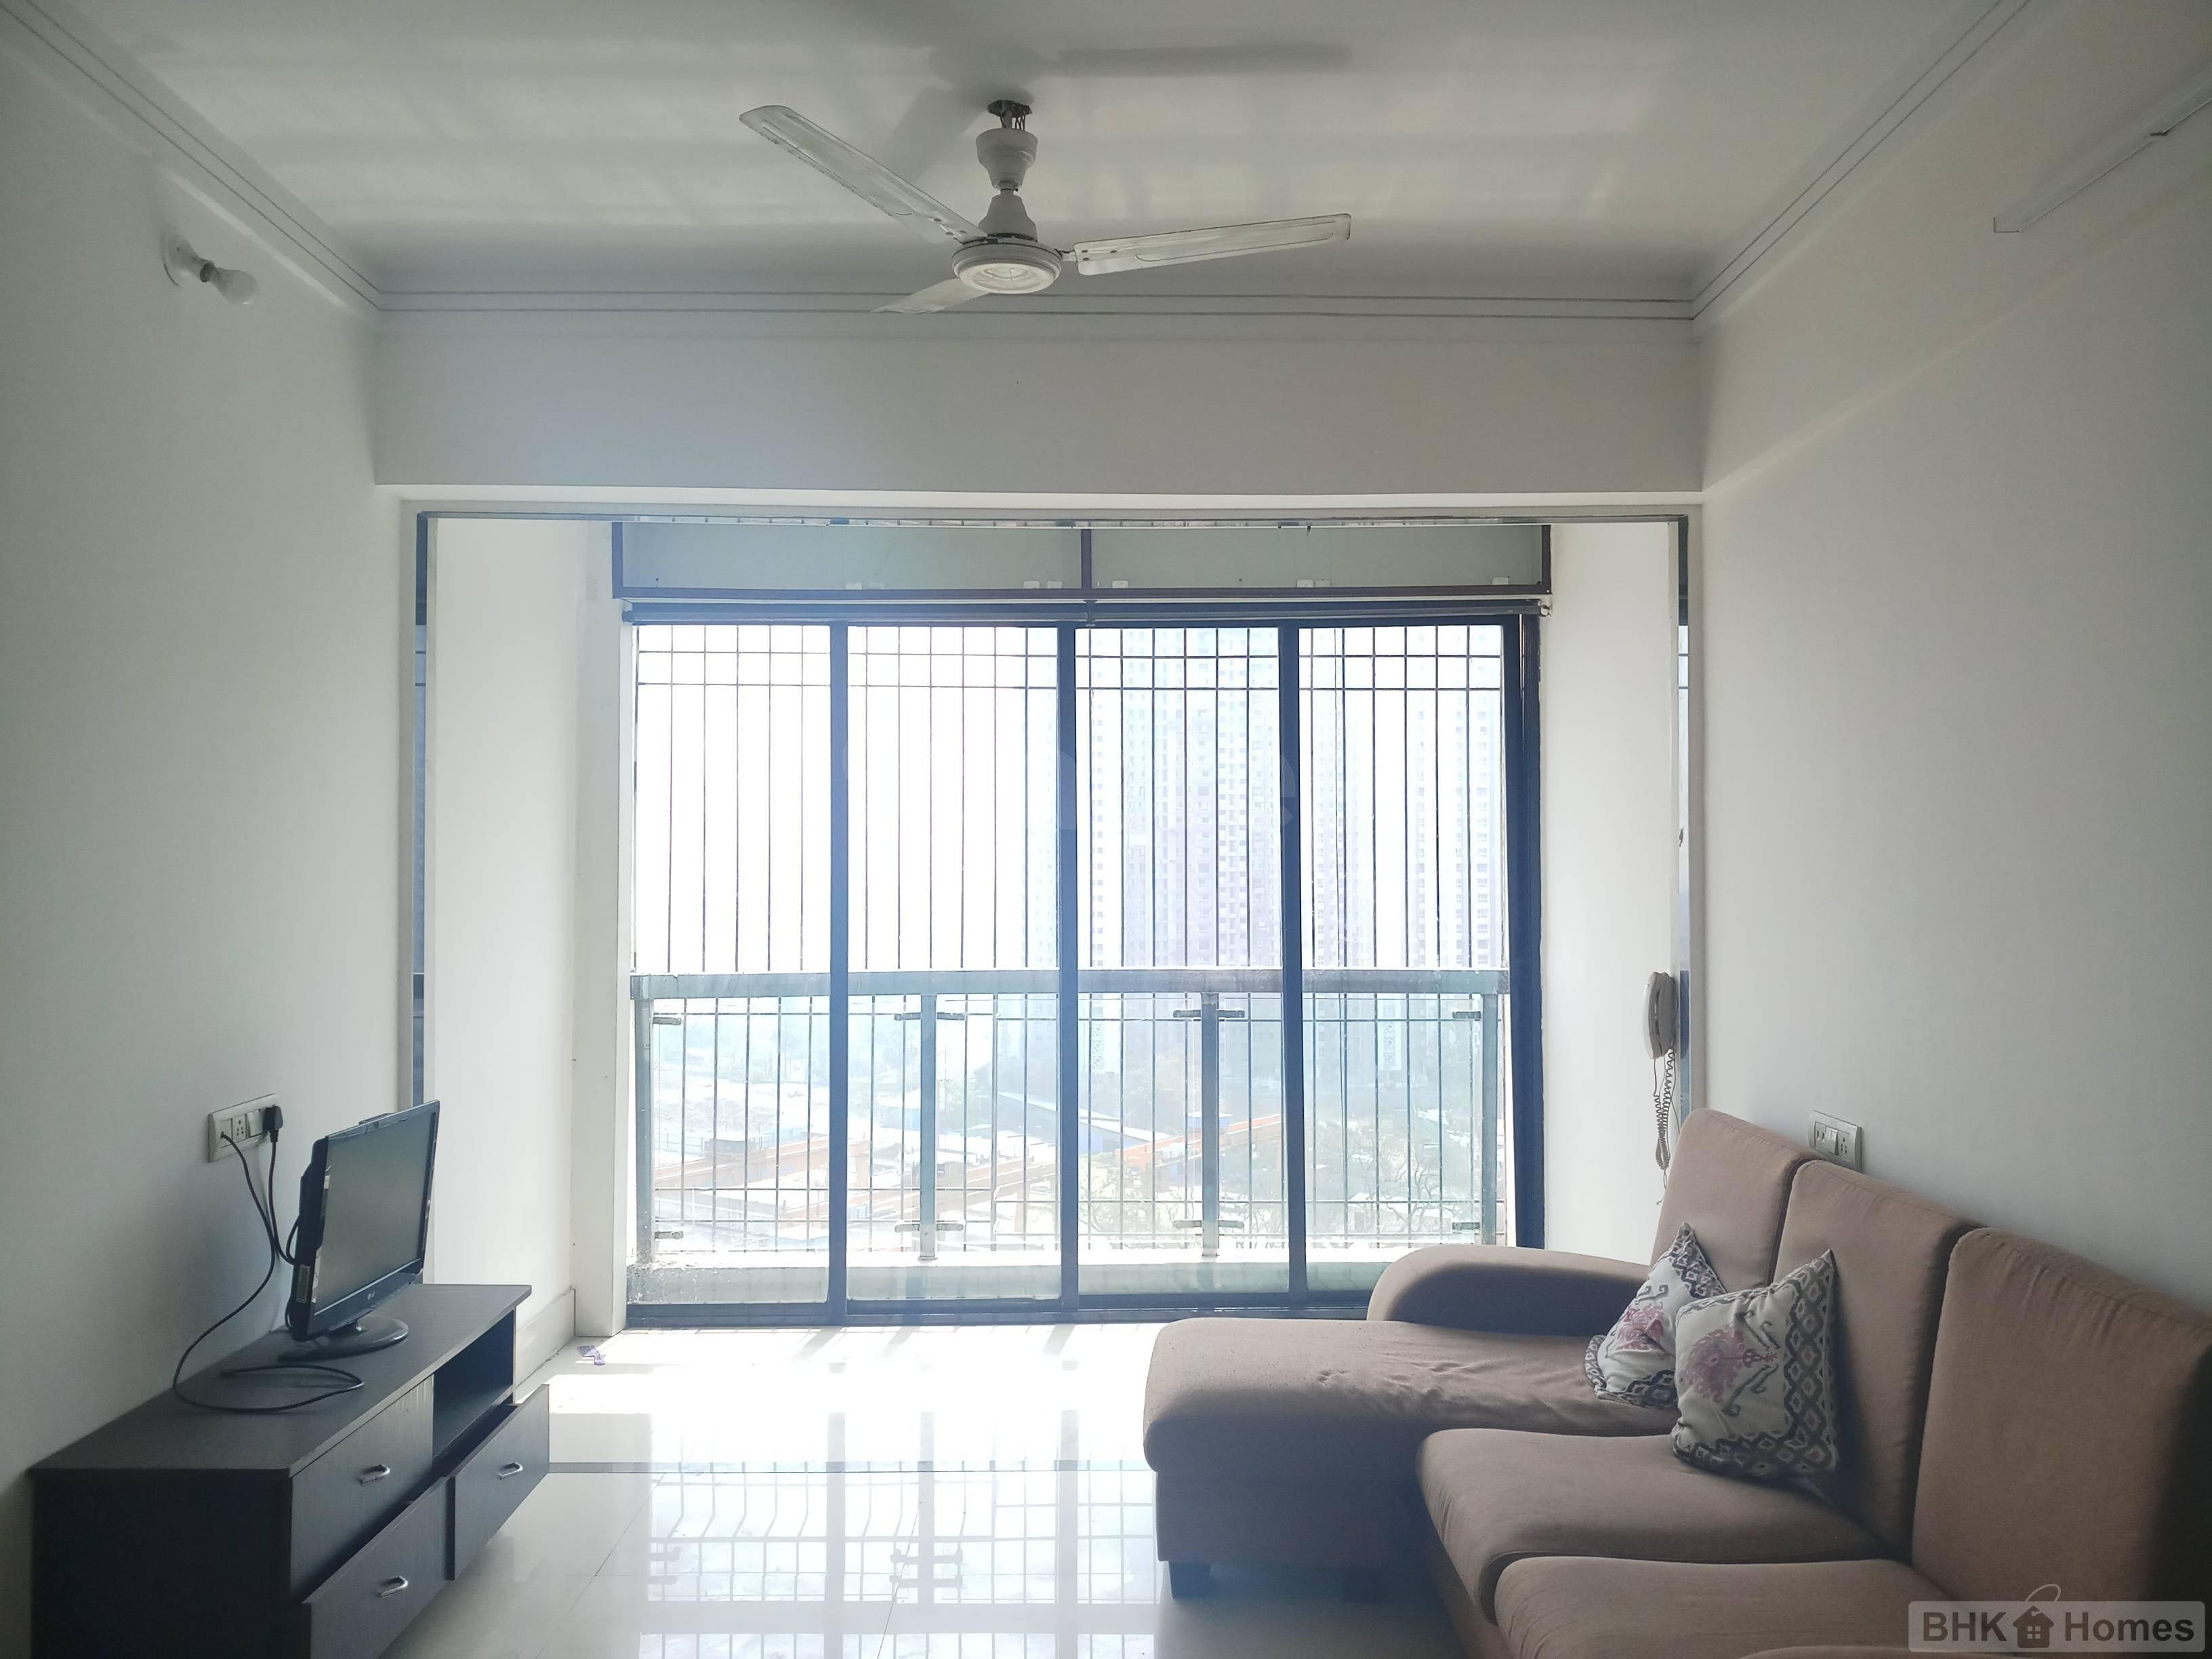 3 BHK  Apartment for Sale in Kolshet Road